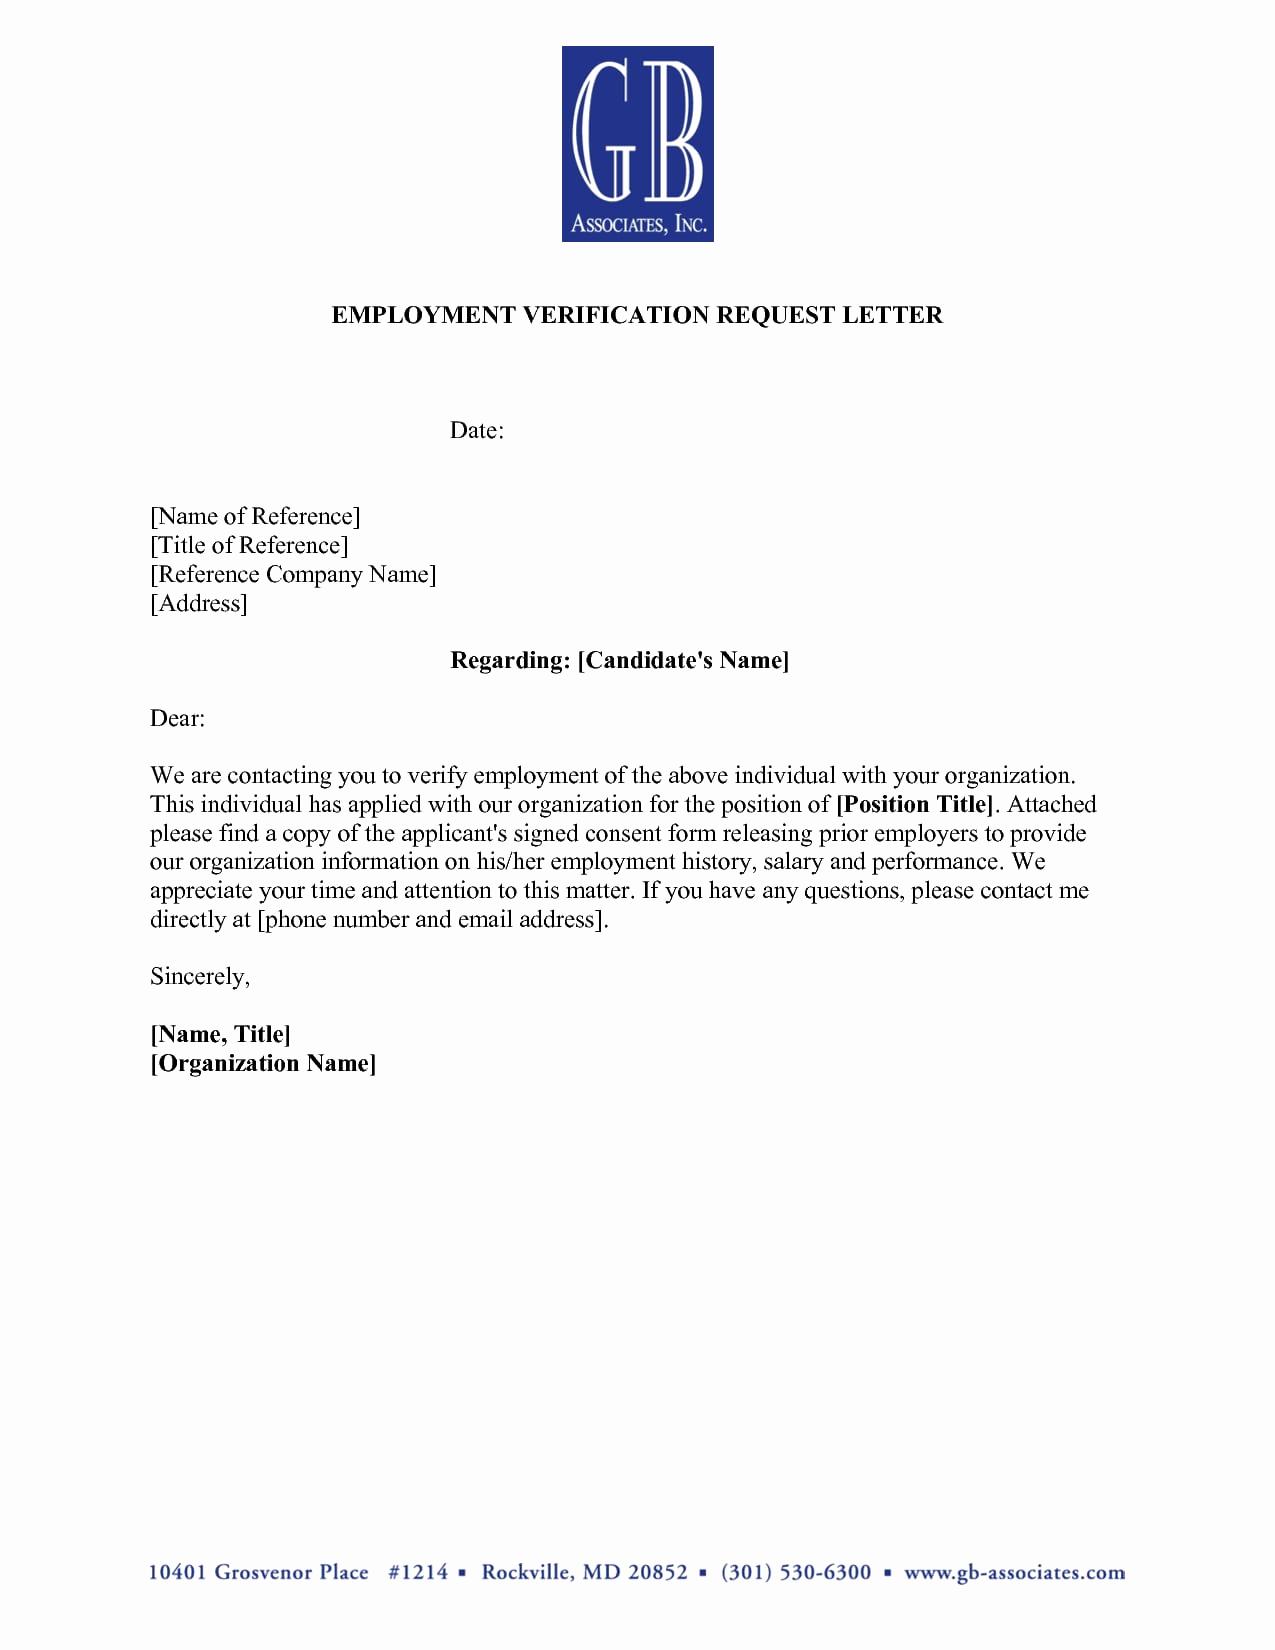 Employment Verification Letter Template Lovely 9 Verification Of Employment Letter Examples Pdf